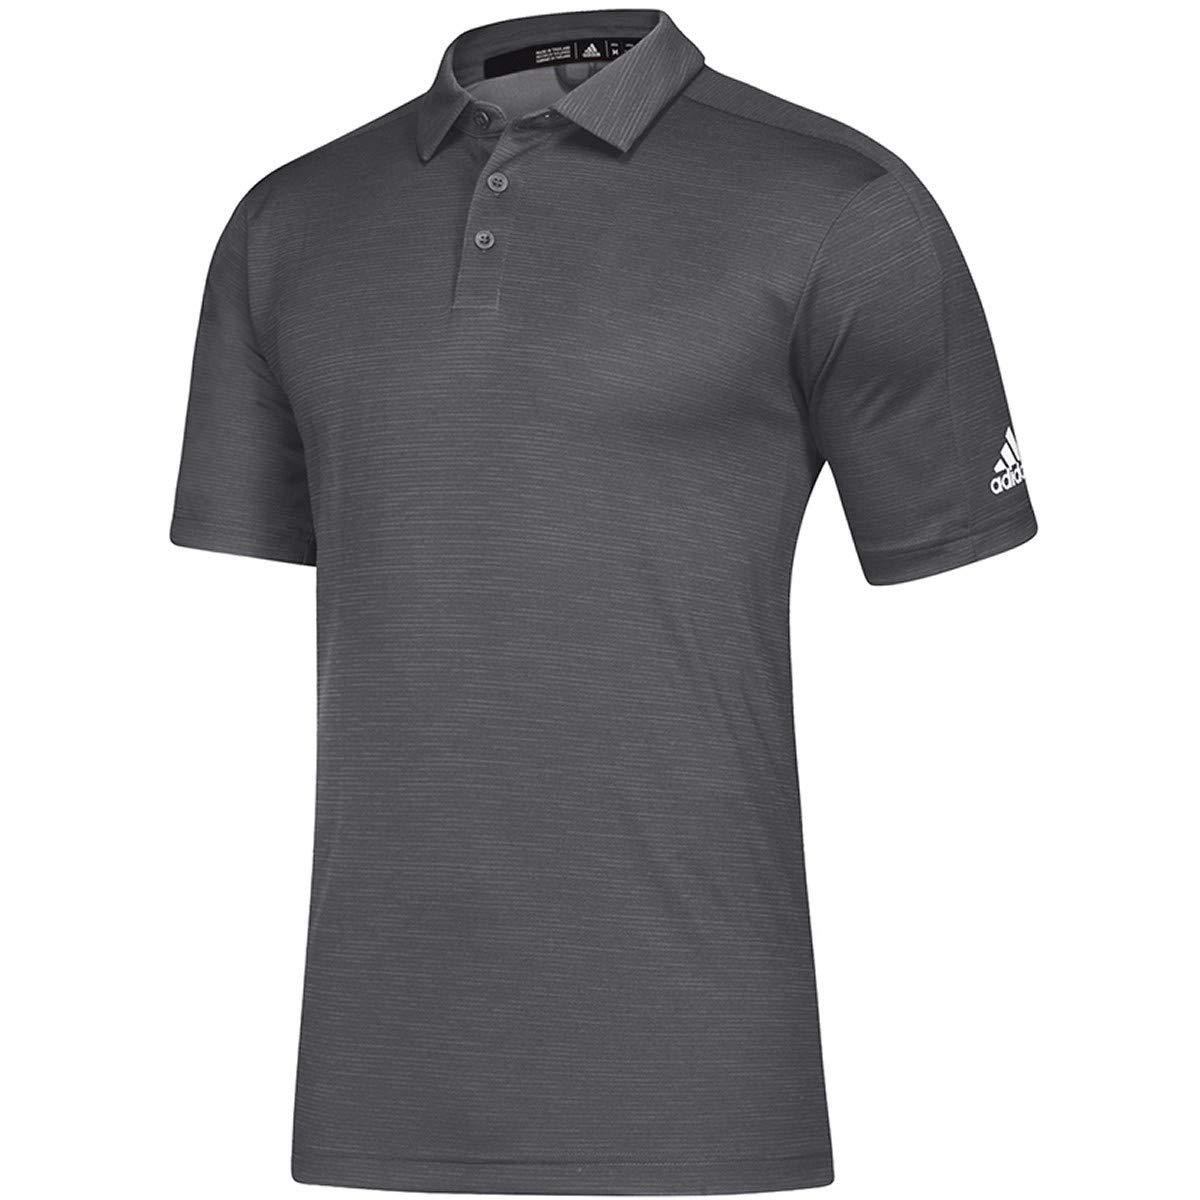 Mens Multi-Sport 4XLT Grey Melange//White adidas Game Mode Polo